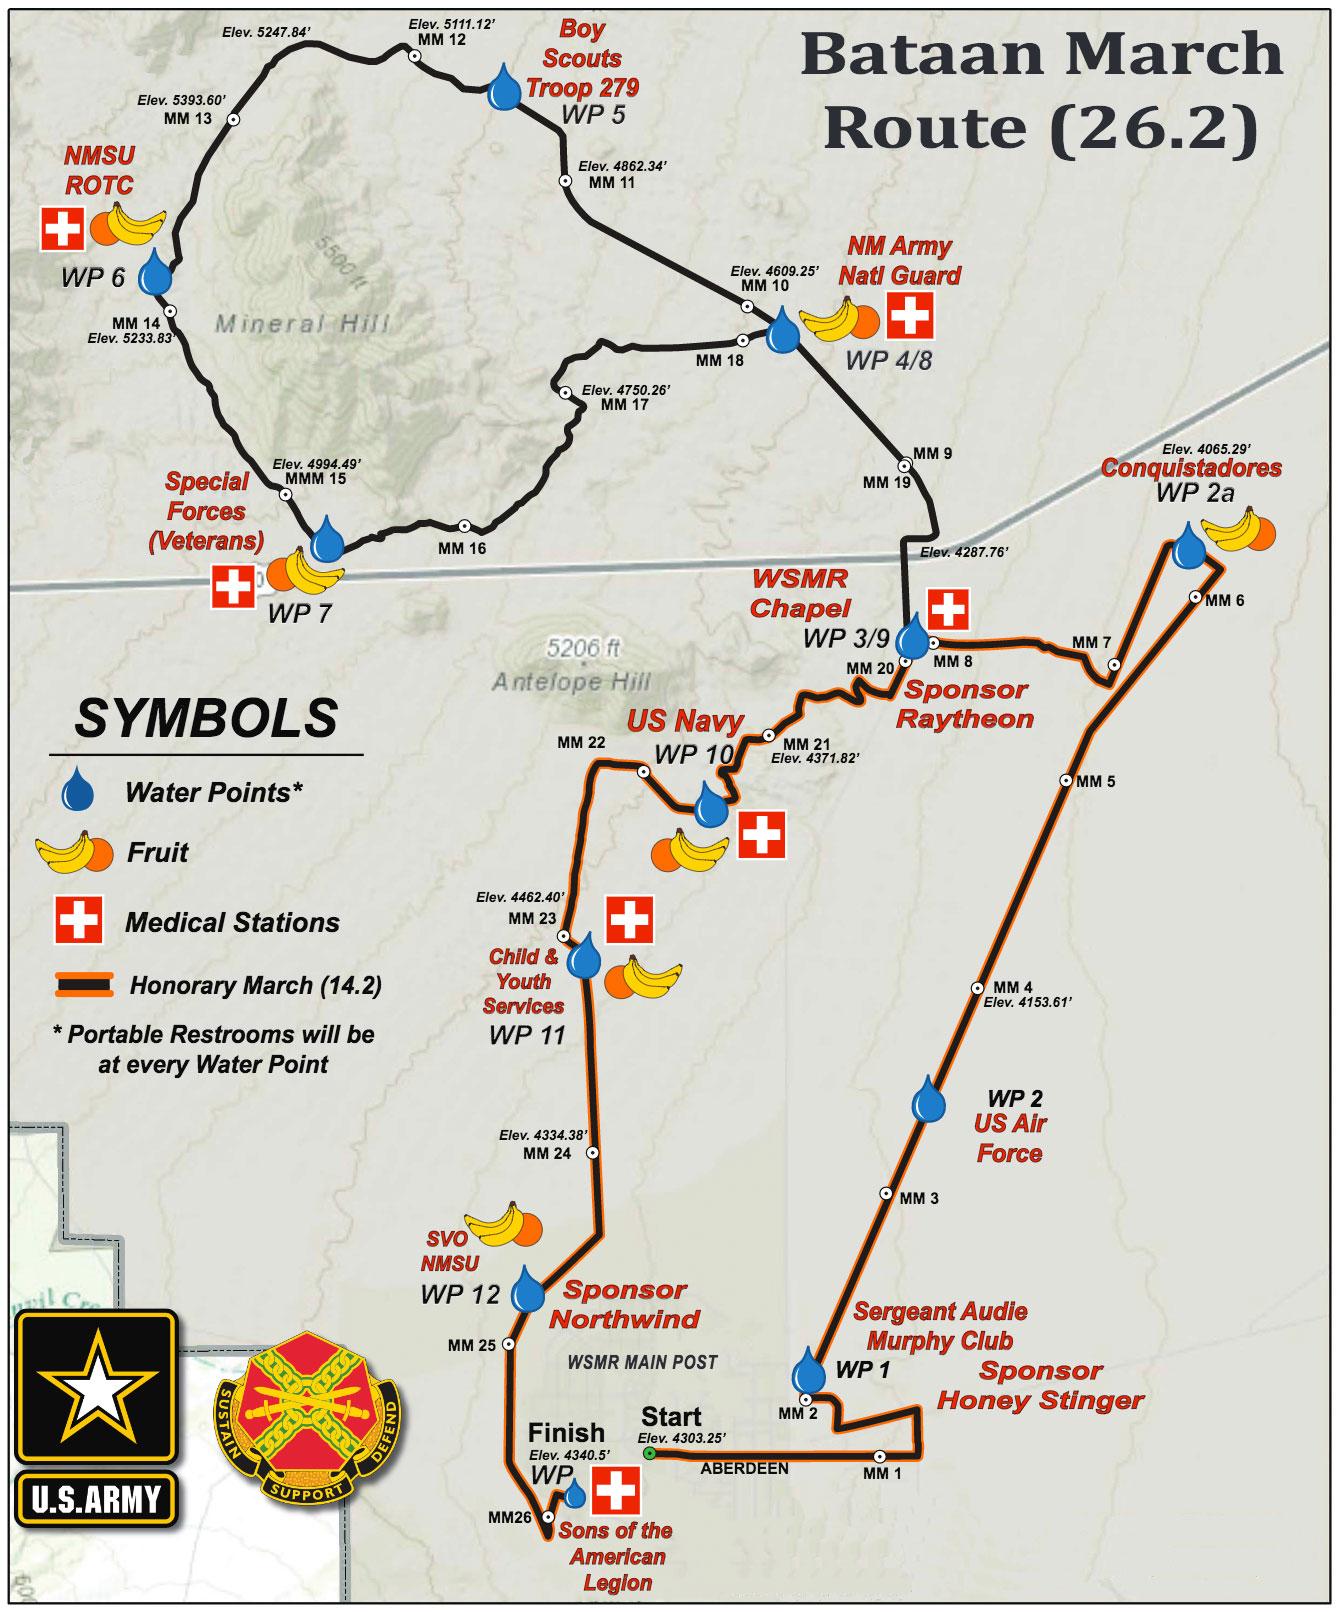 Bataan Memorial Death March course route